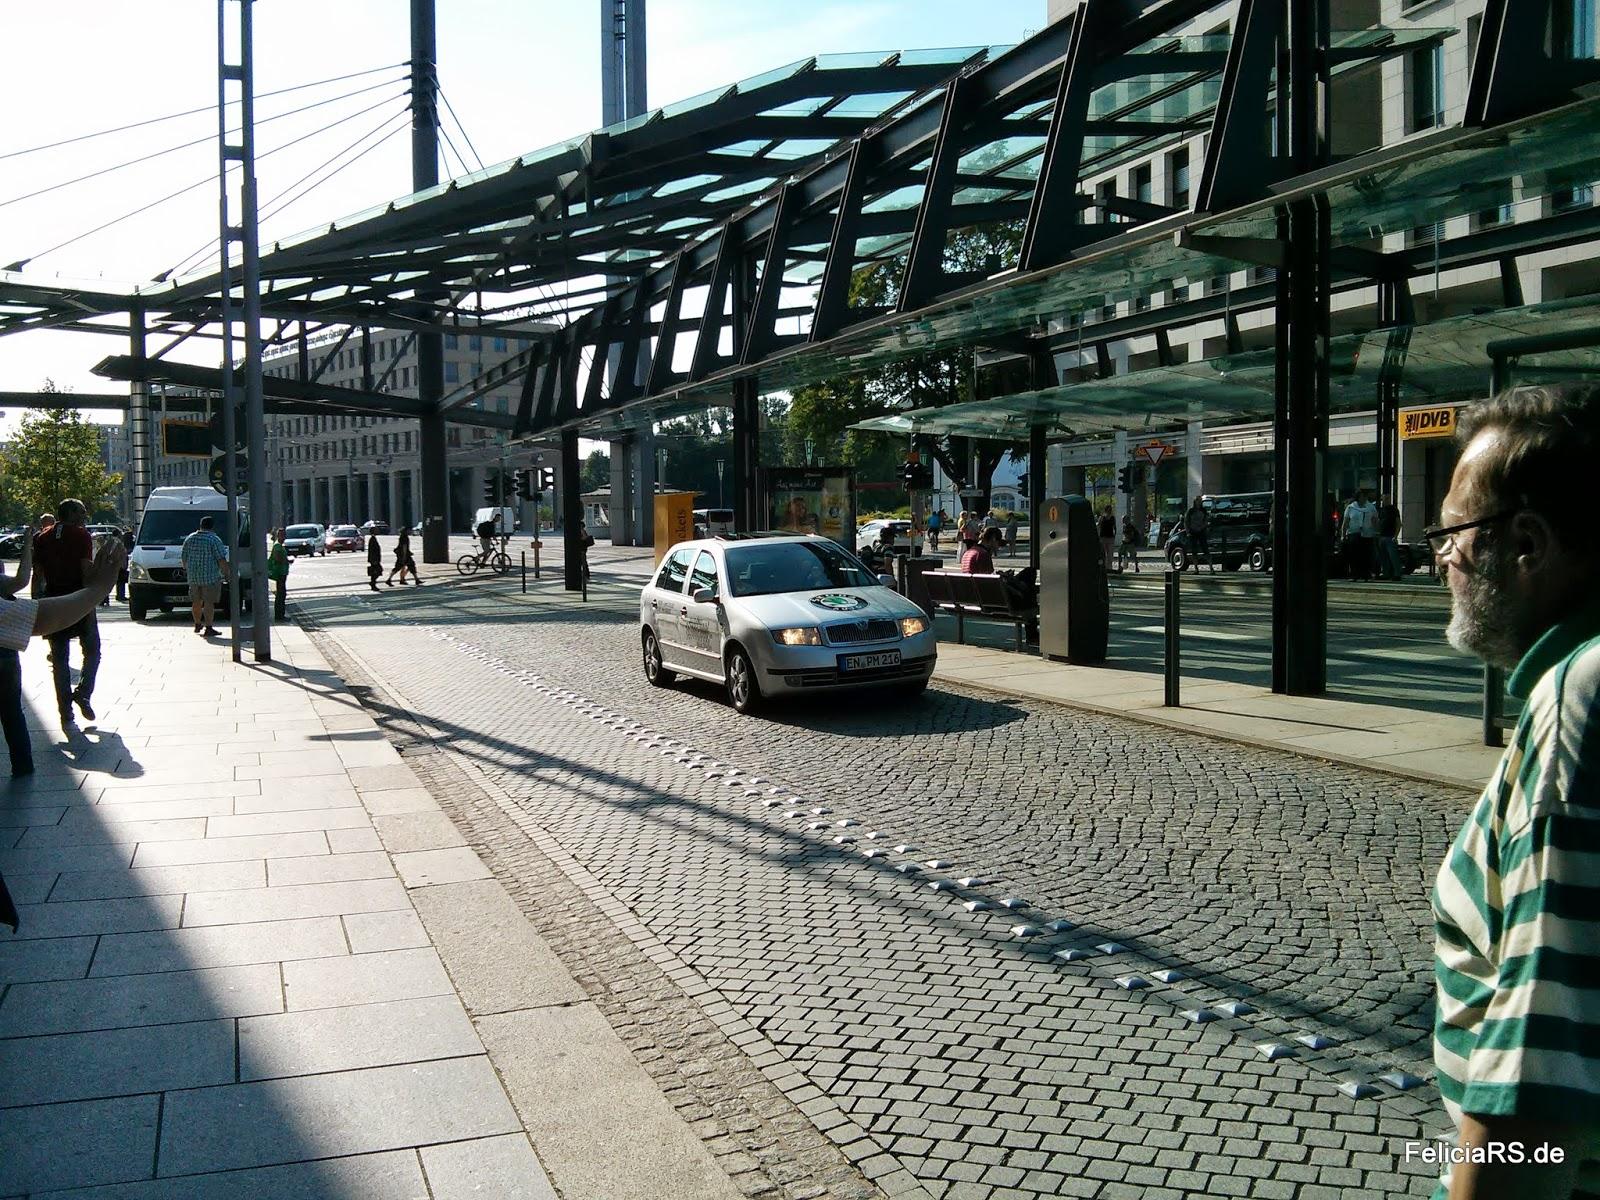 Peter musste zum Videodreh nochmal in Dresden rumfahren...